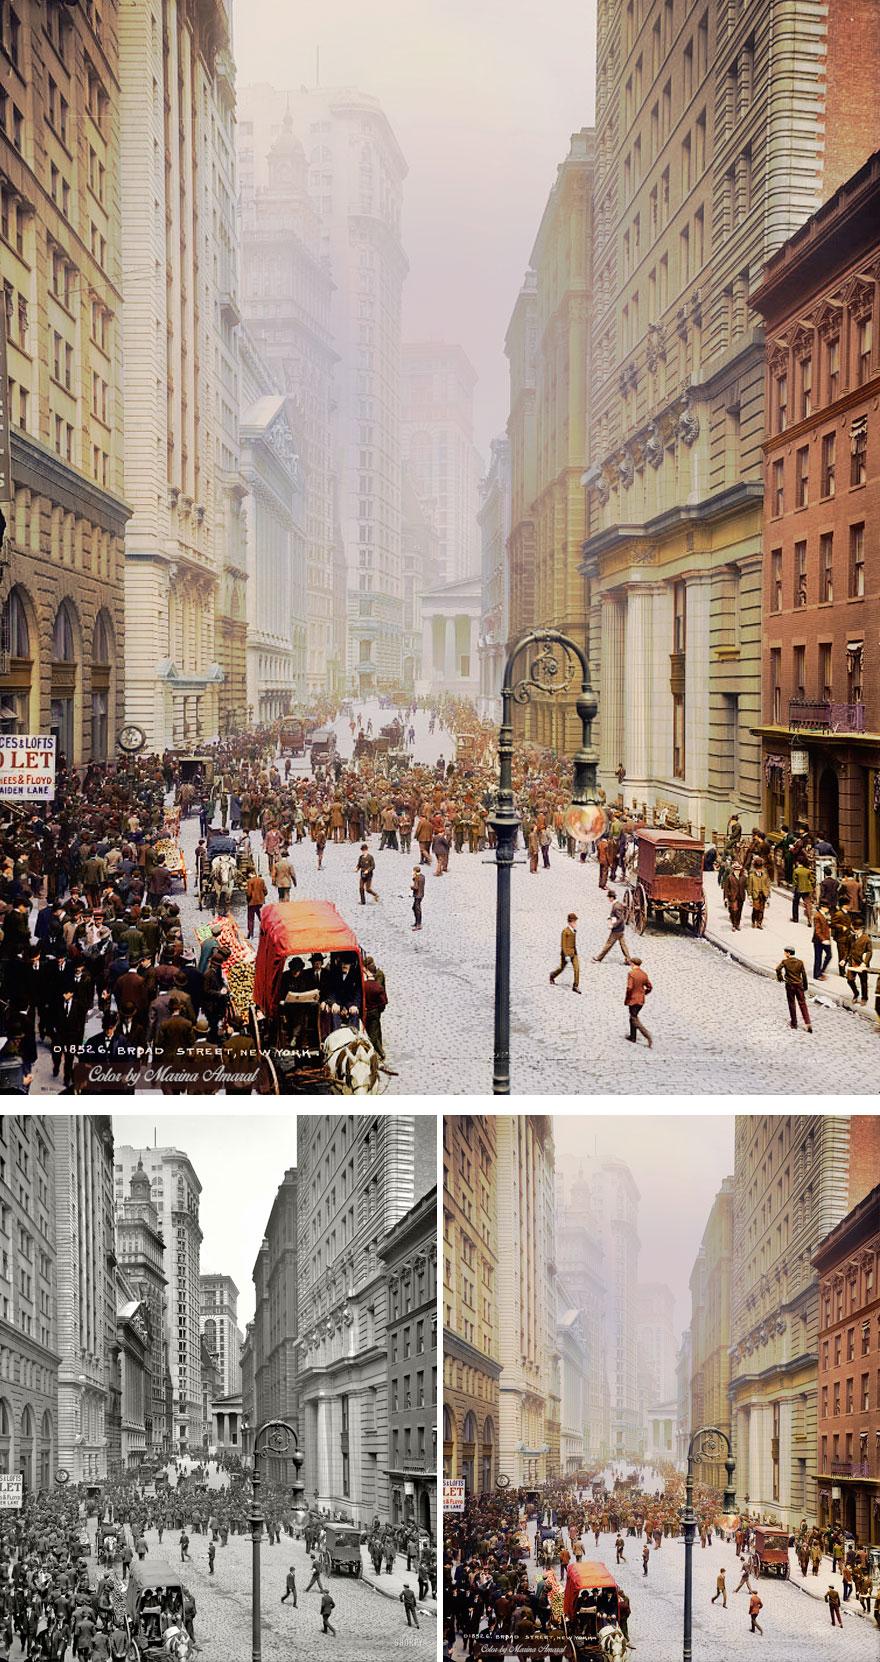 Broad Street, New York